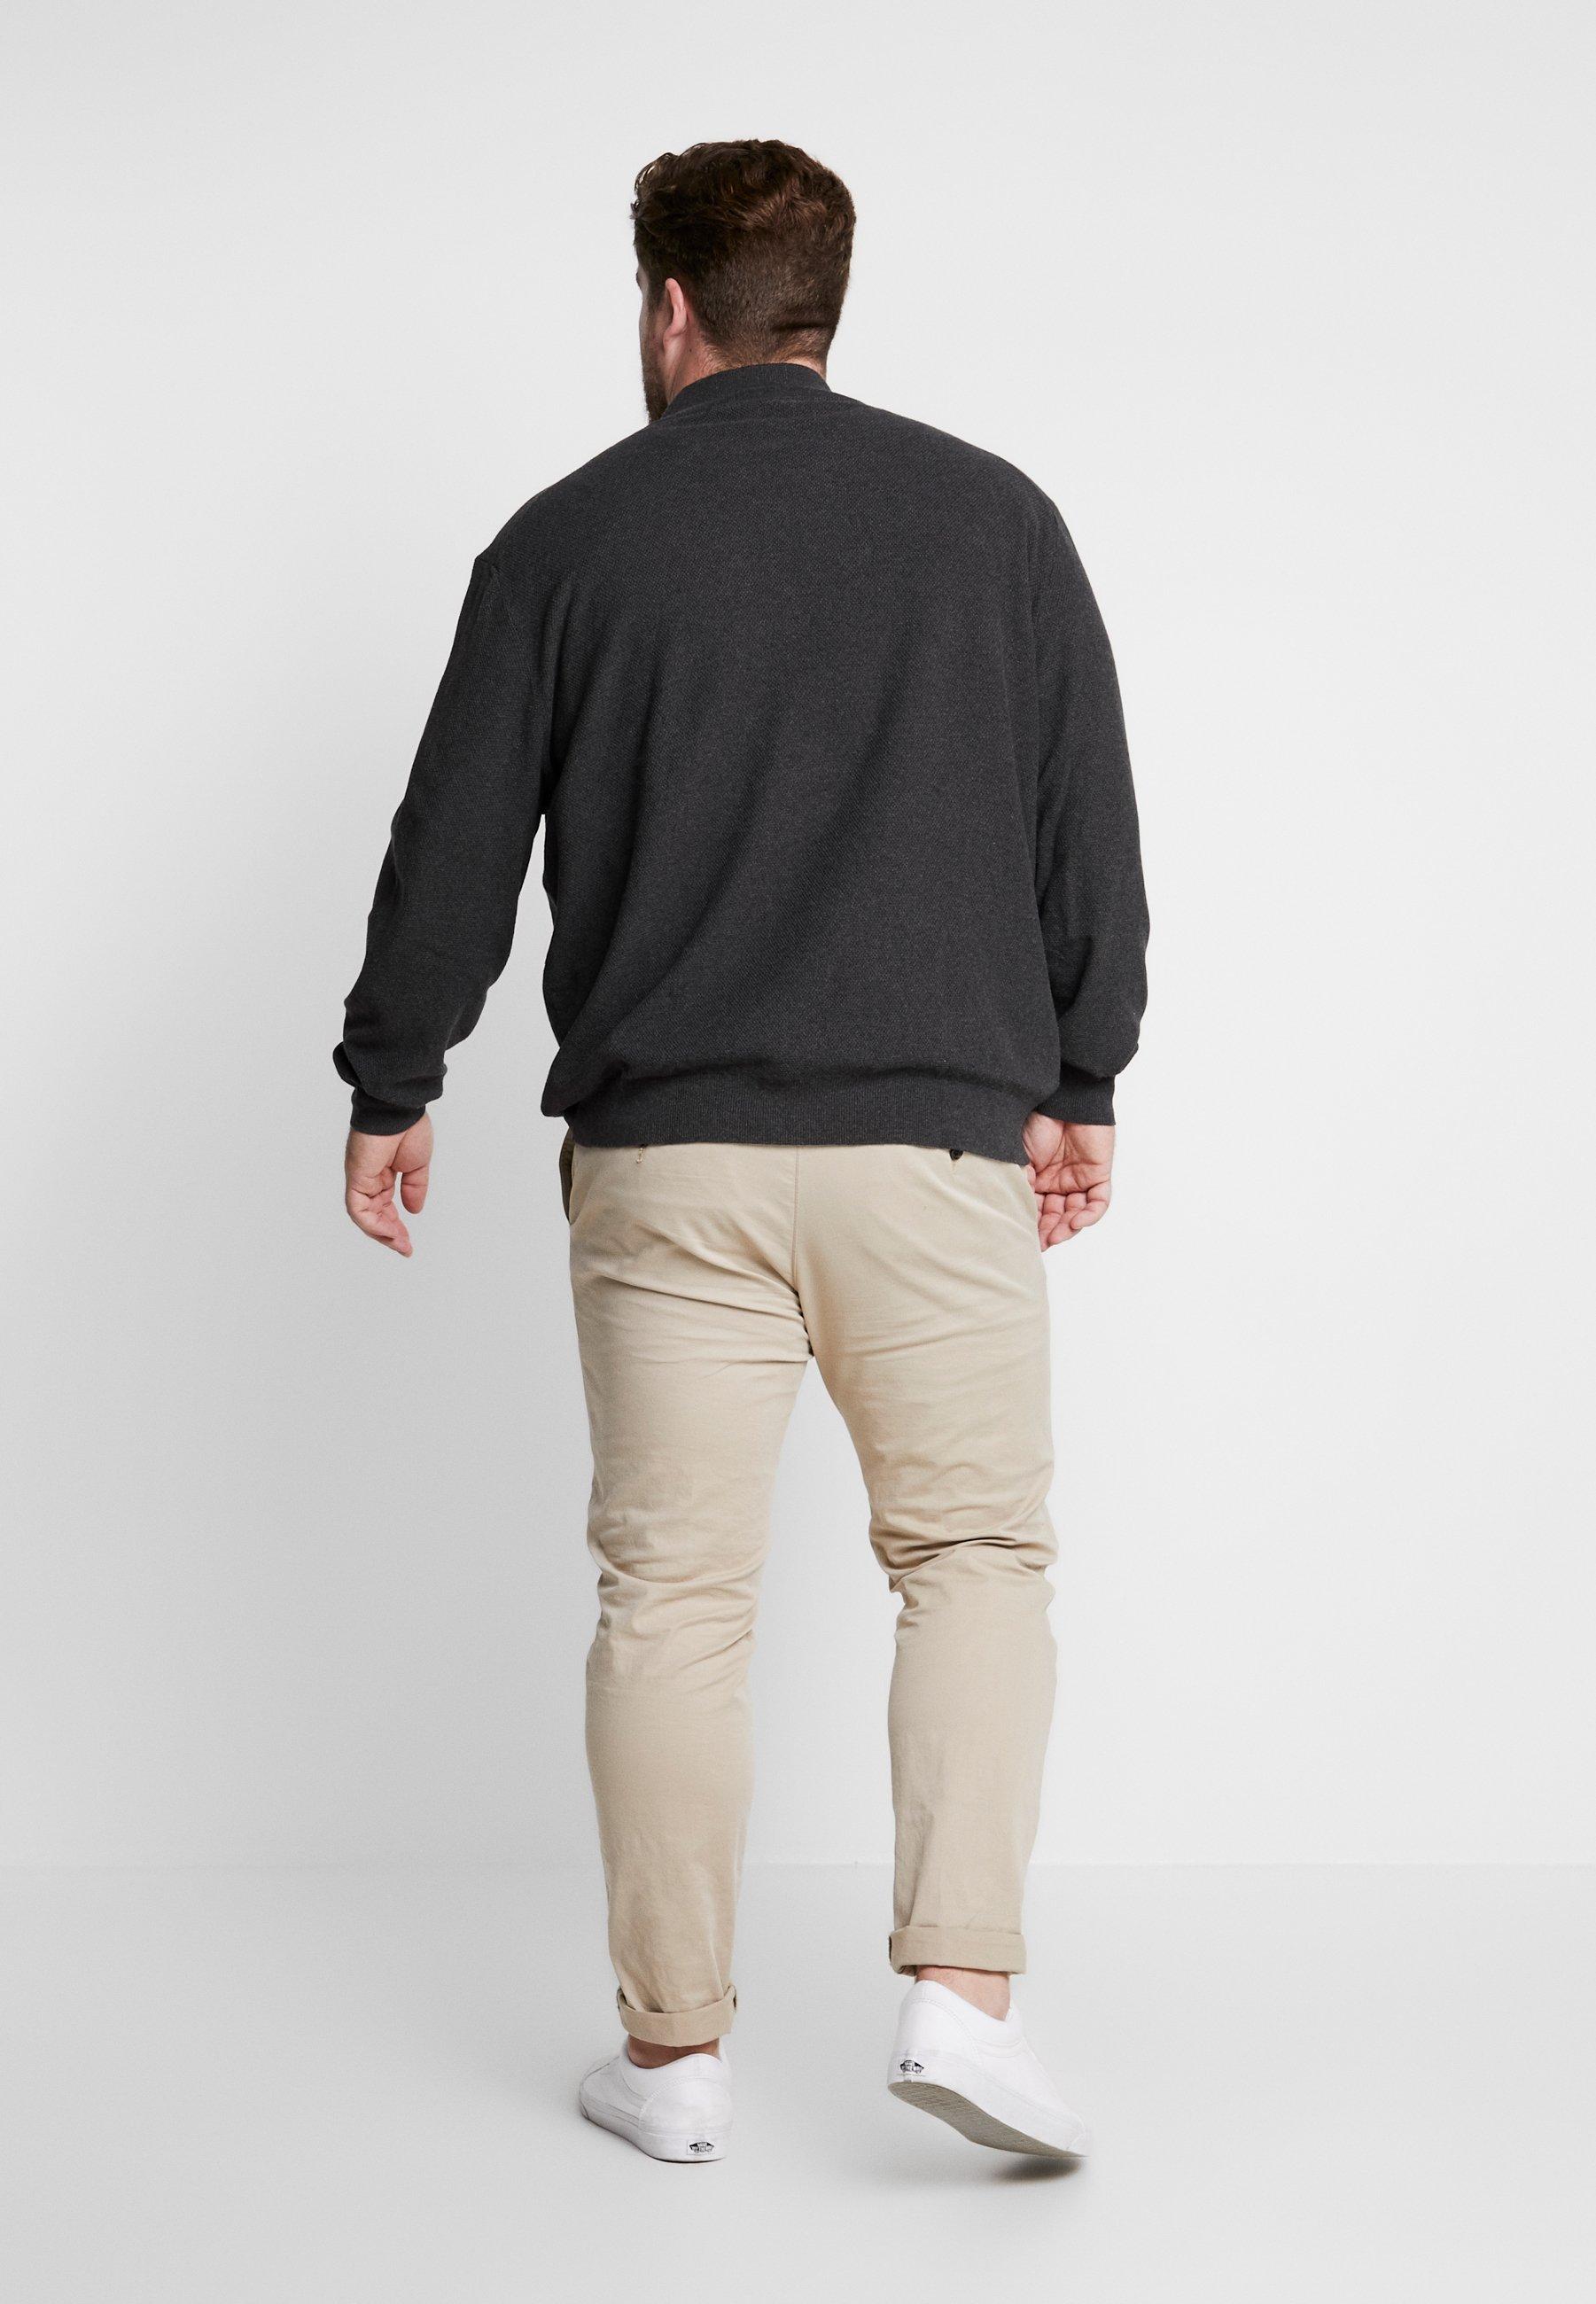 Scott Plus Stitch Moss Charcoal Zip Marl Lyleamp; JumperPullover rBQdeExoWC